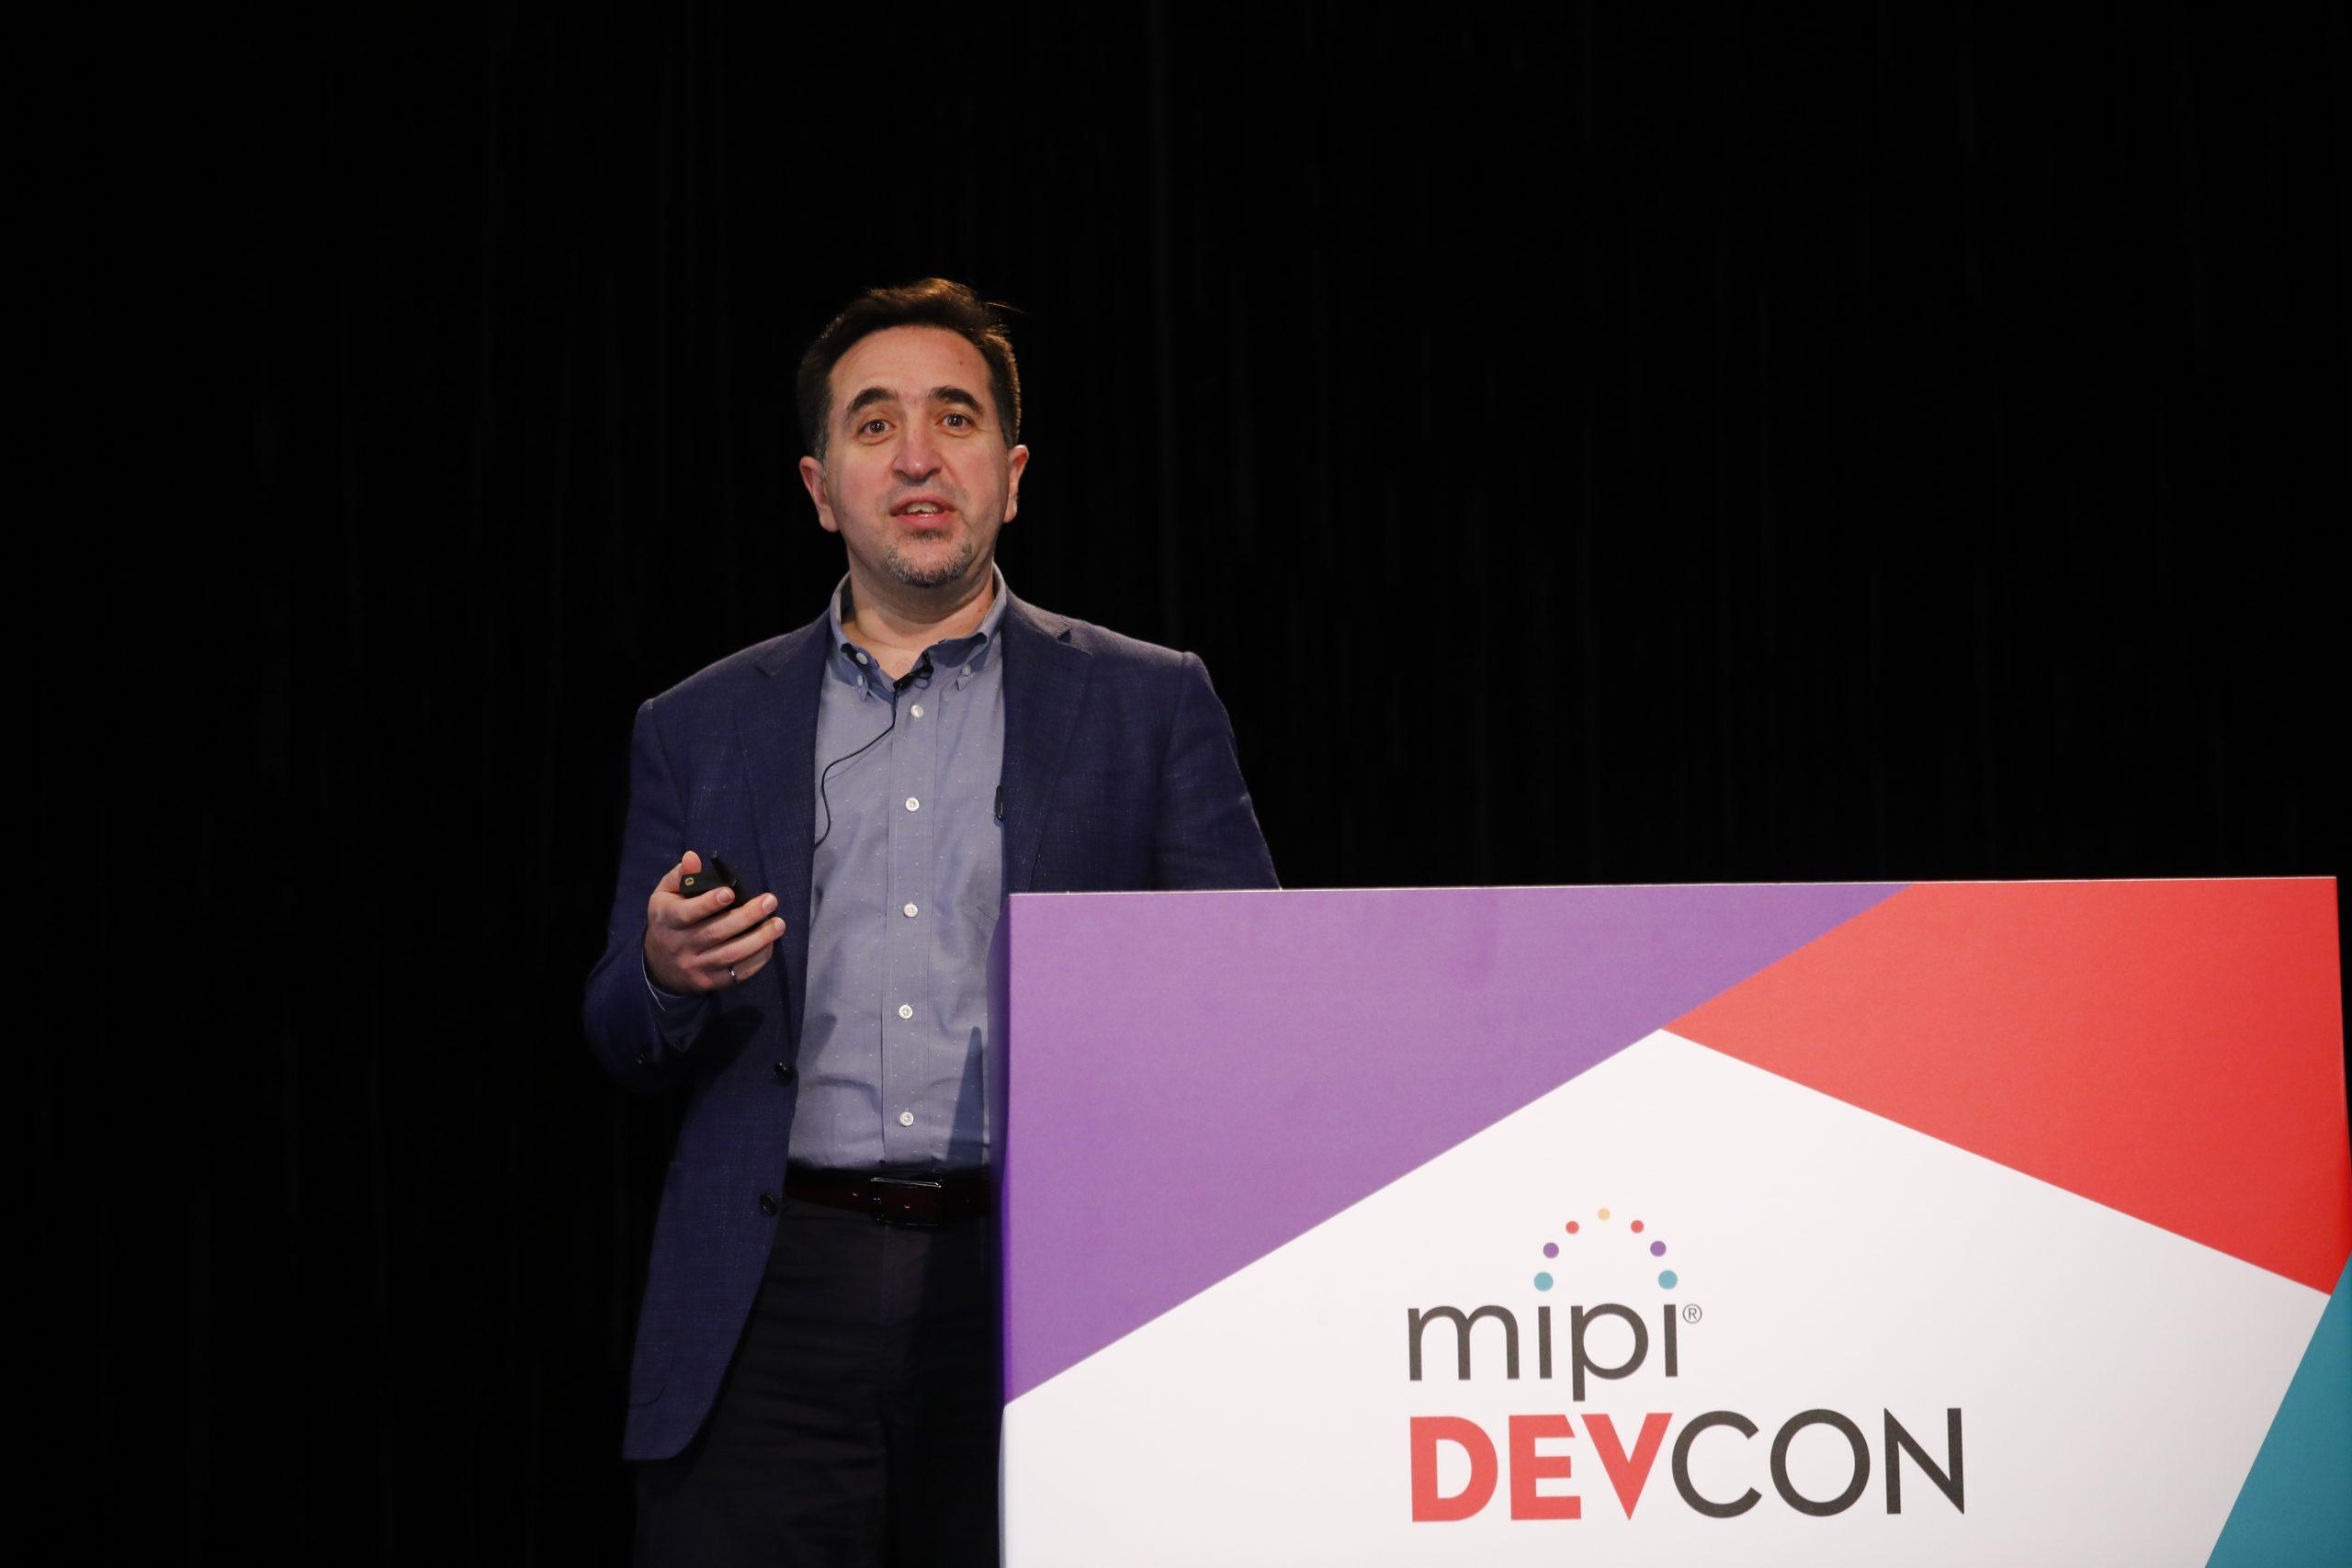 MIPI DevCon